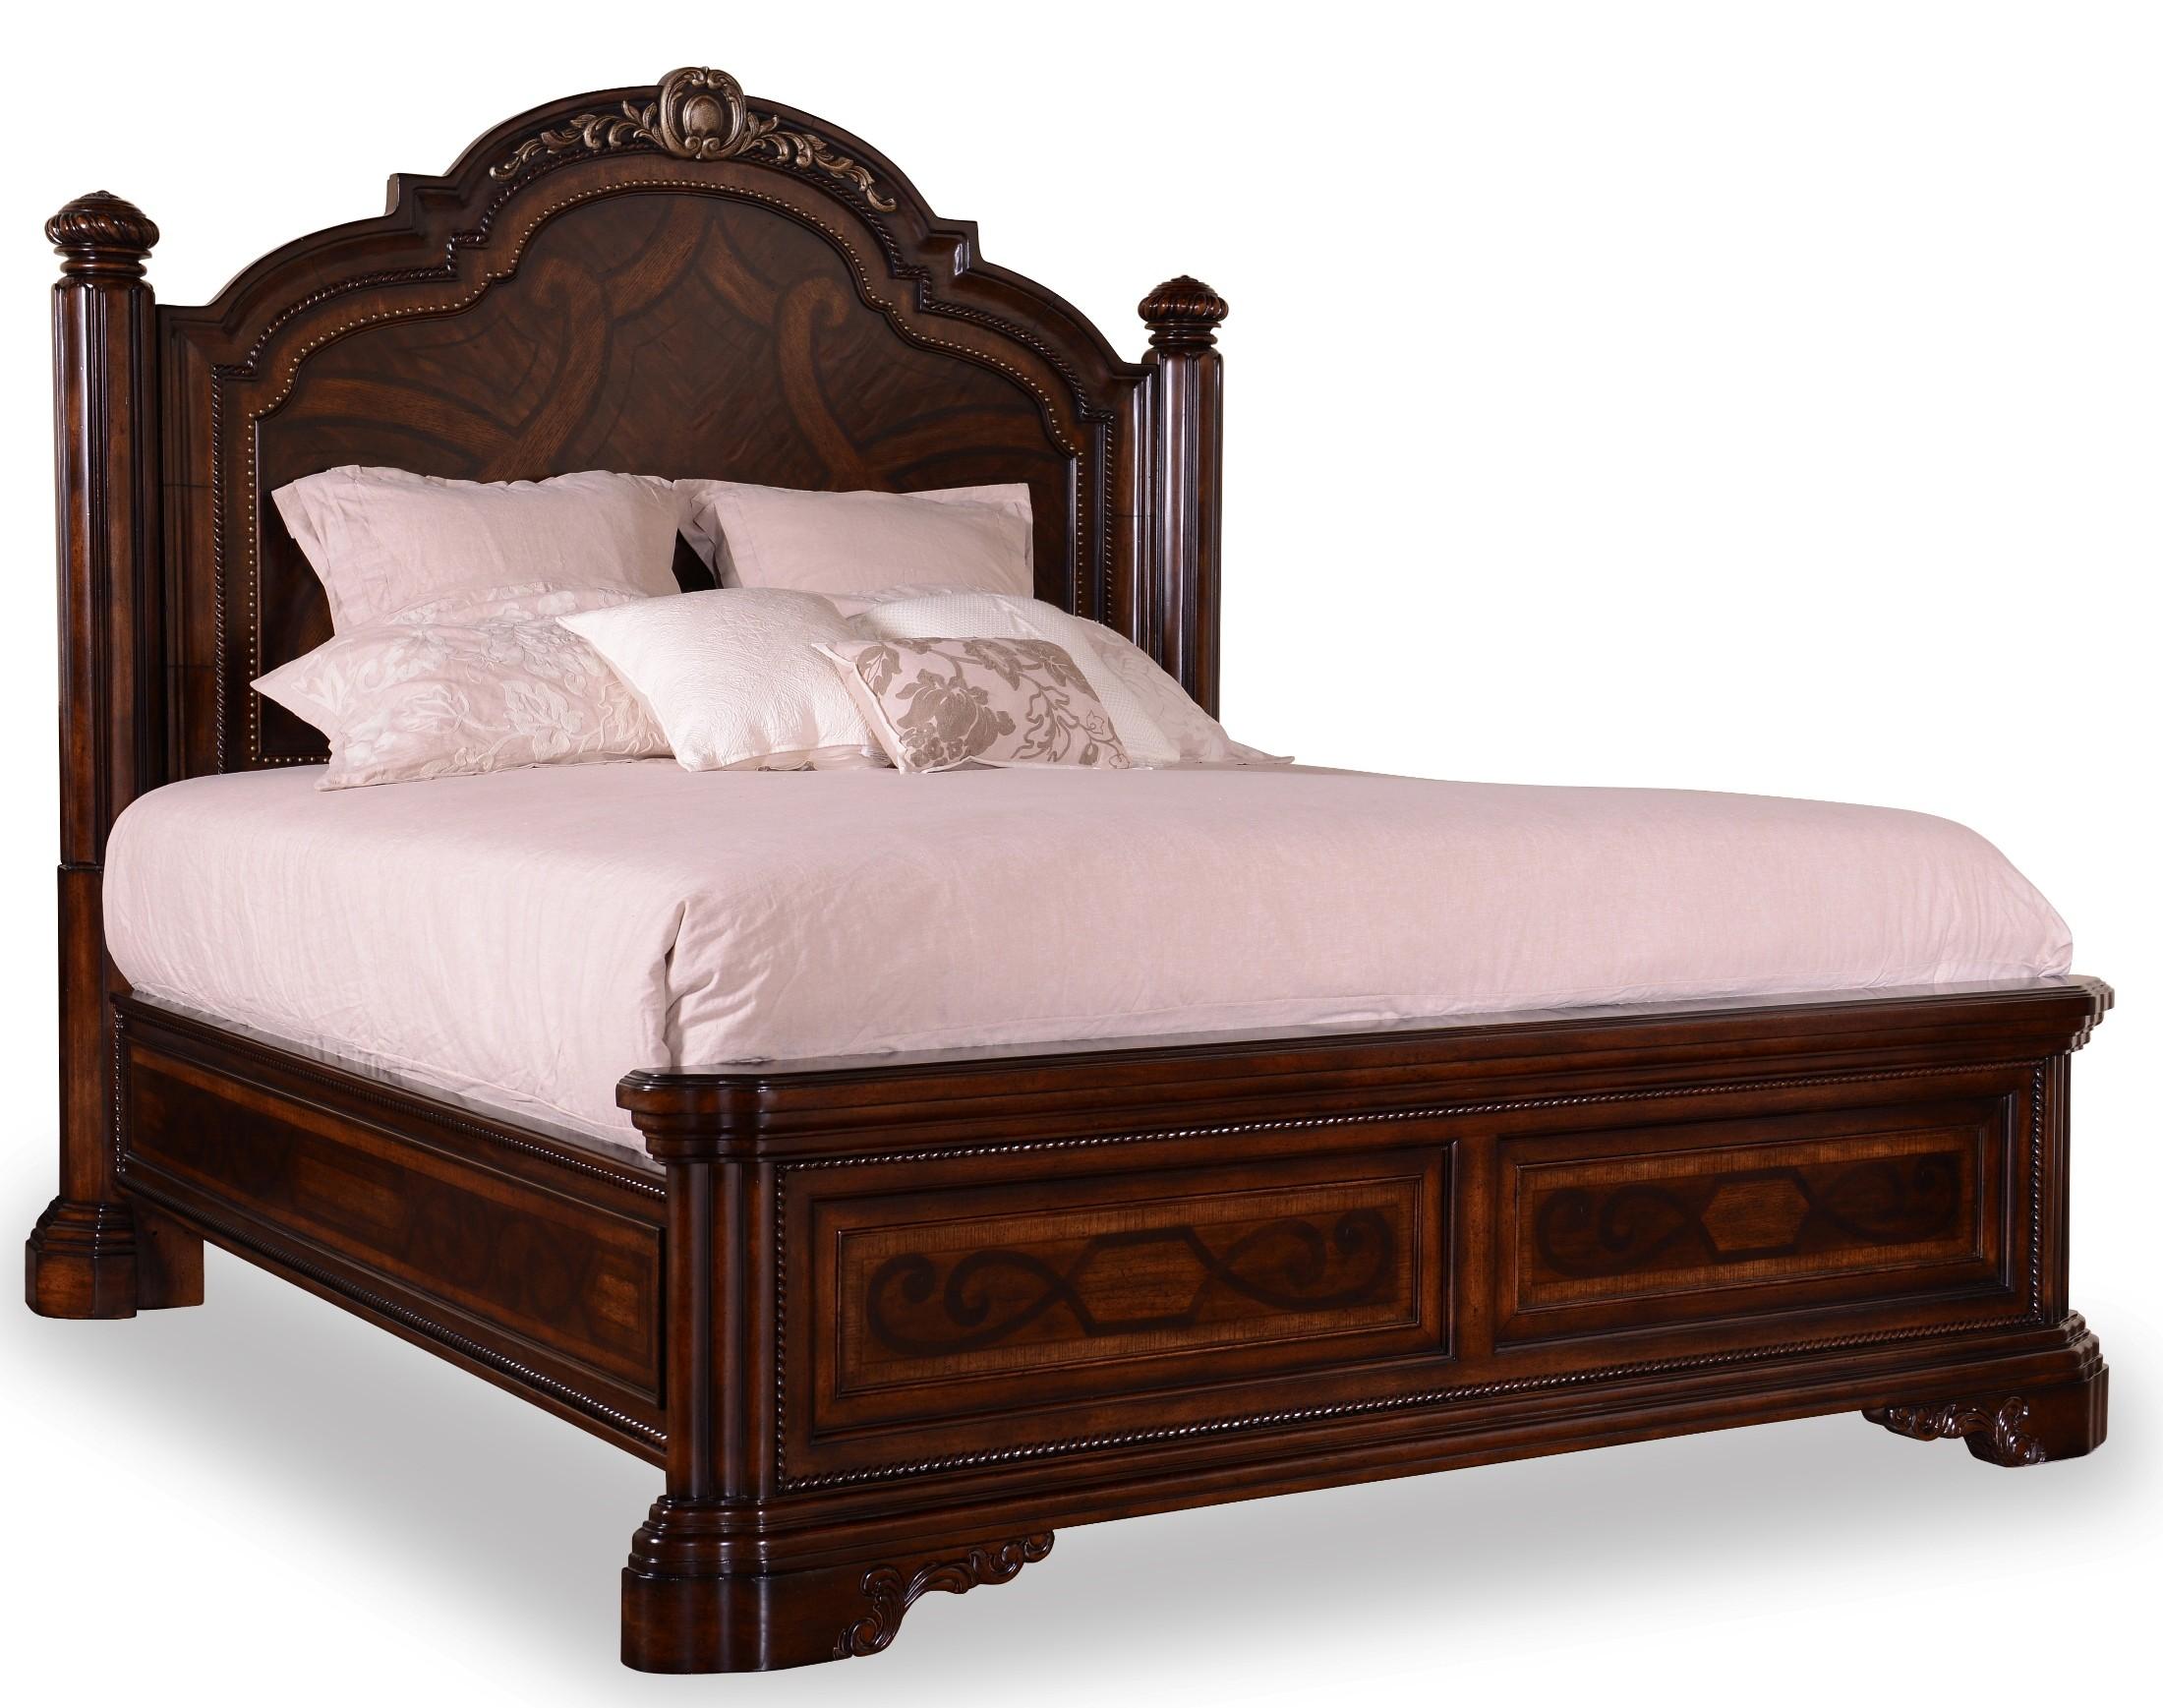 Valencia Panel Bedroom Set From ART (209125-2304